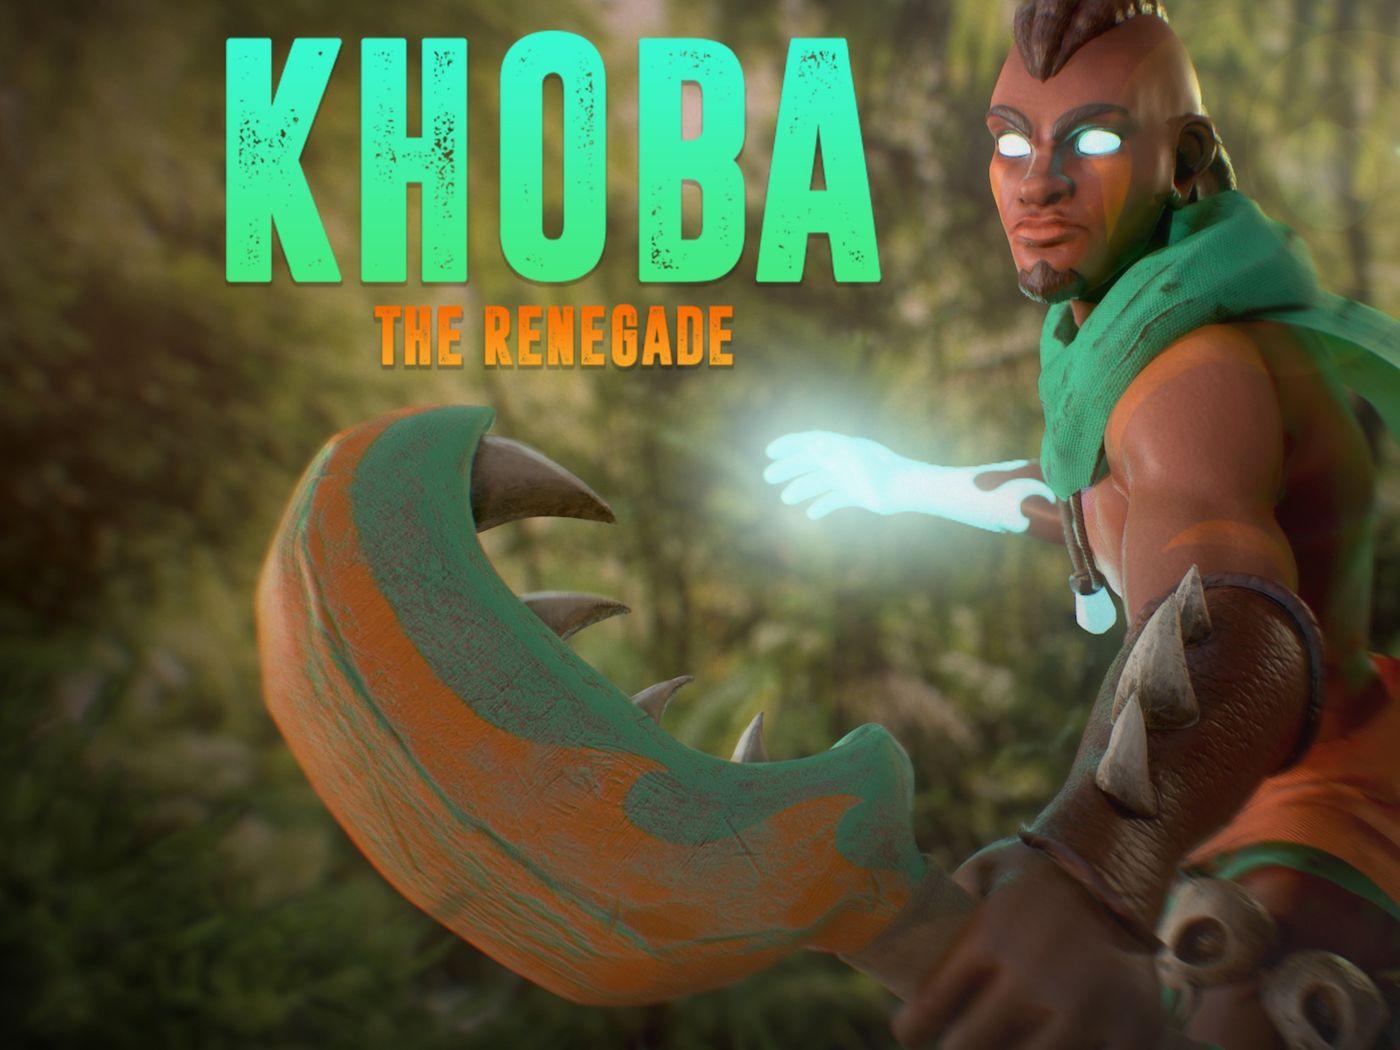 Khoba: The Renegade